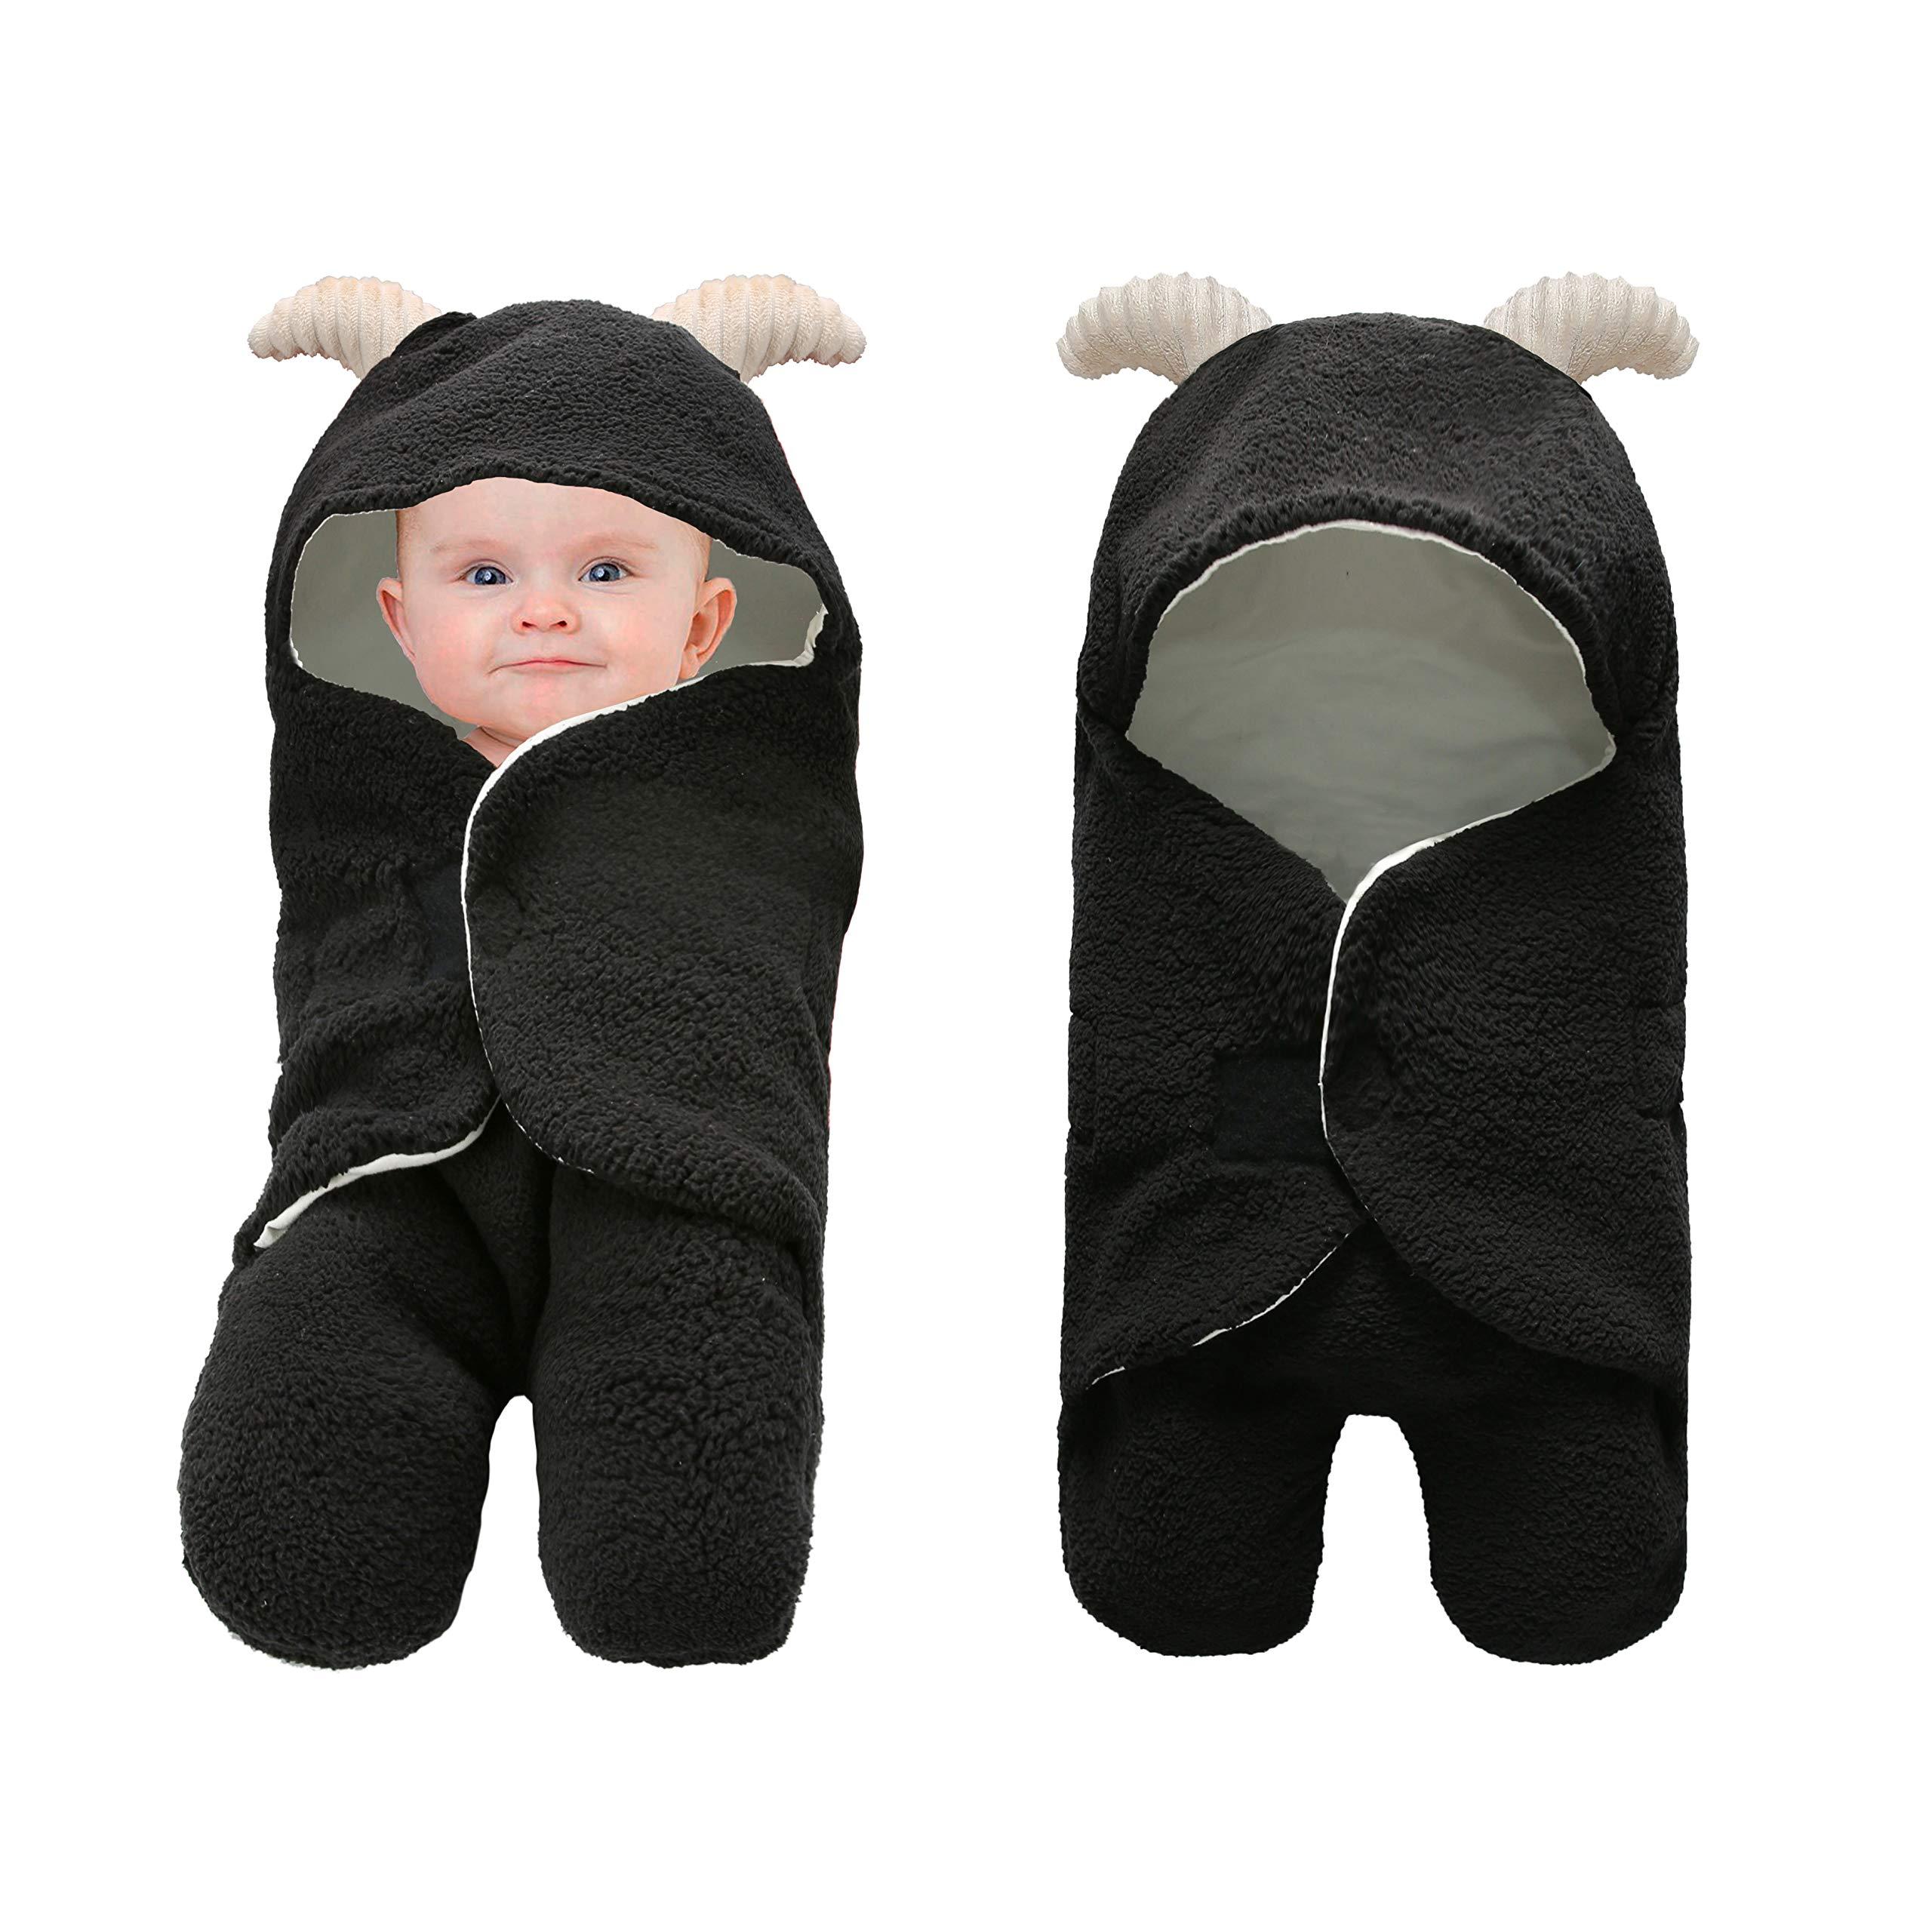 Pro Goleem Unisex Baby Swaddle Blanket Black Ultra-Soft 0-6 Month Receiving Wrap Shower Gift